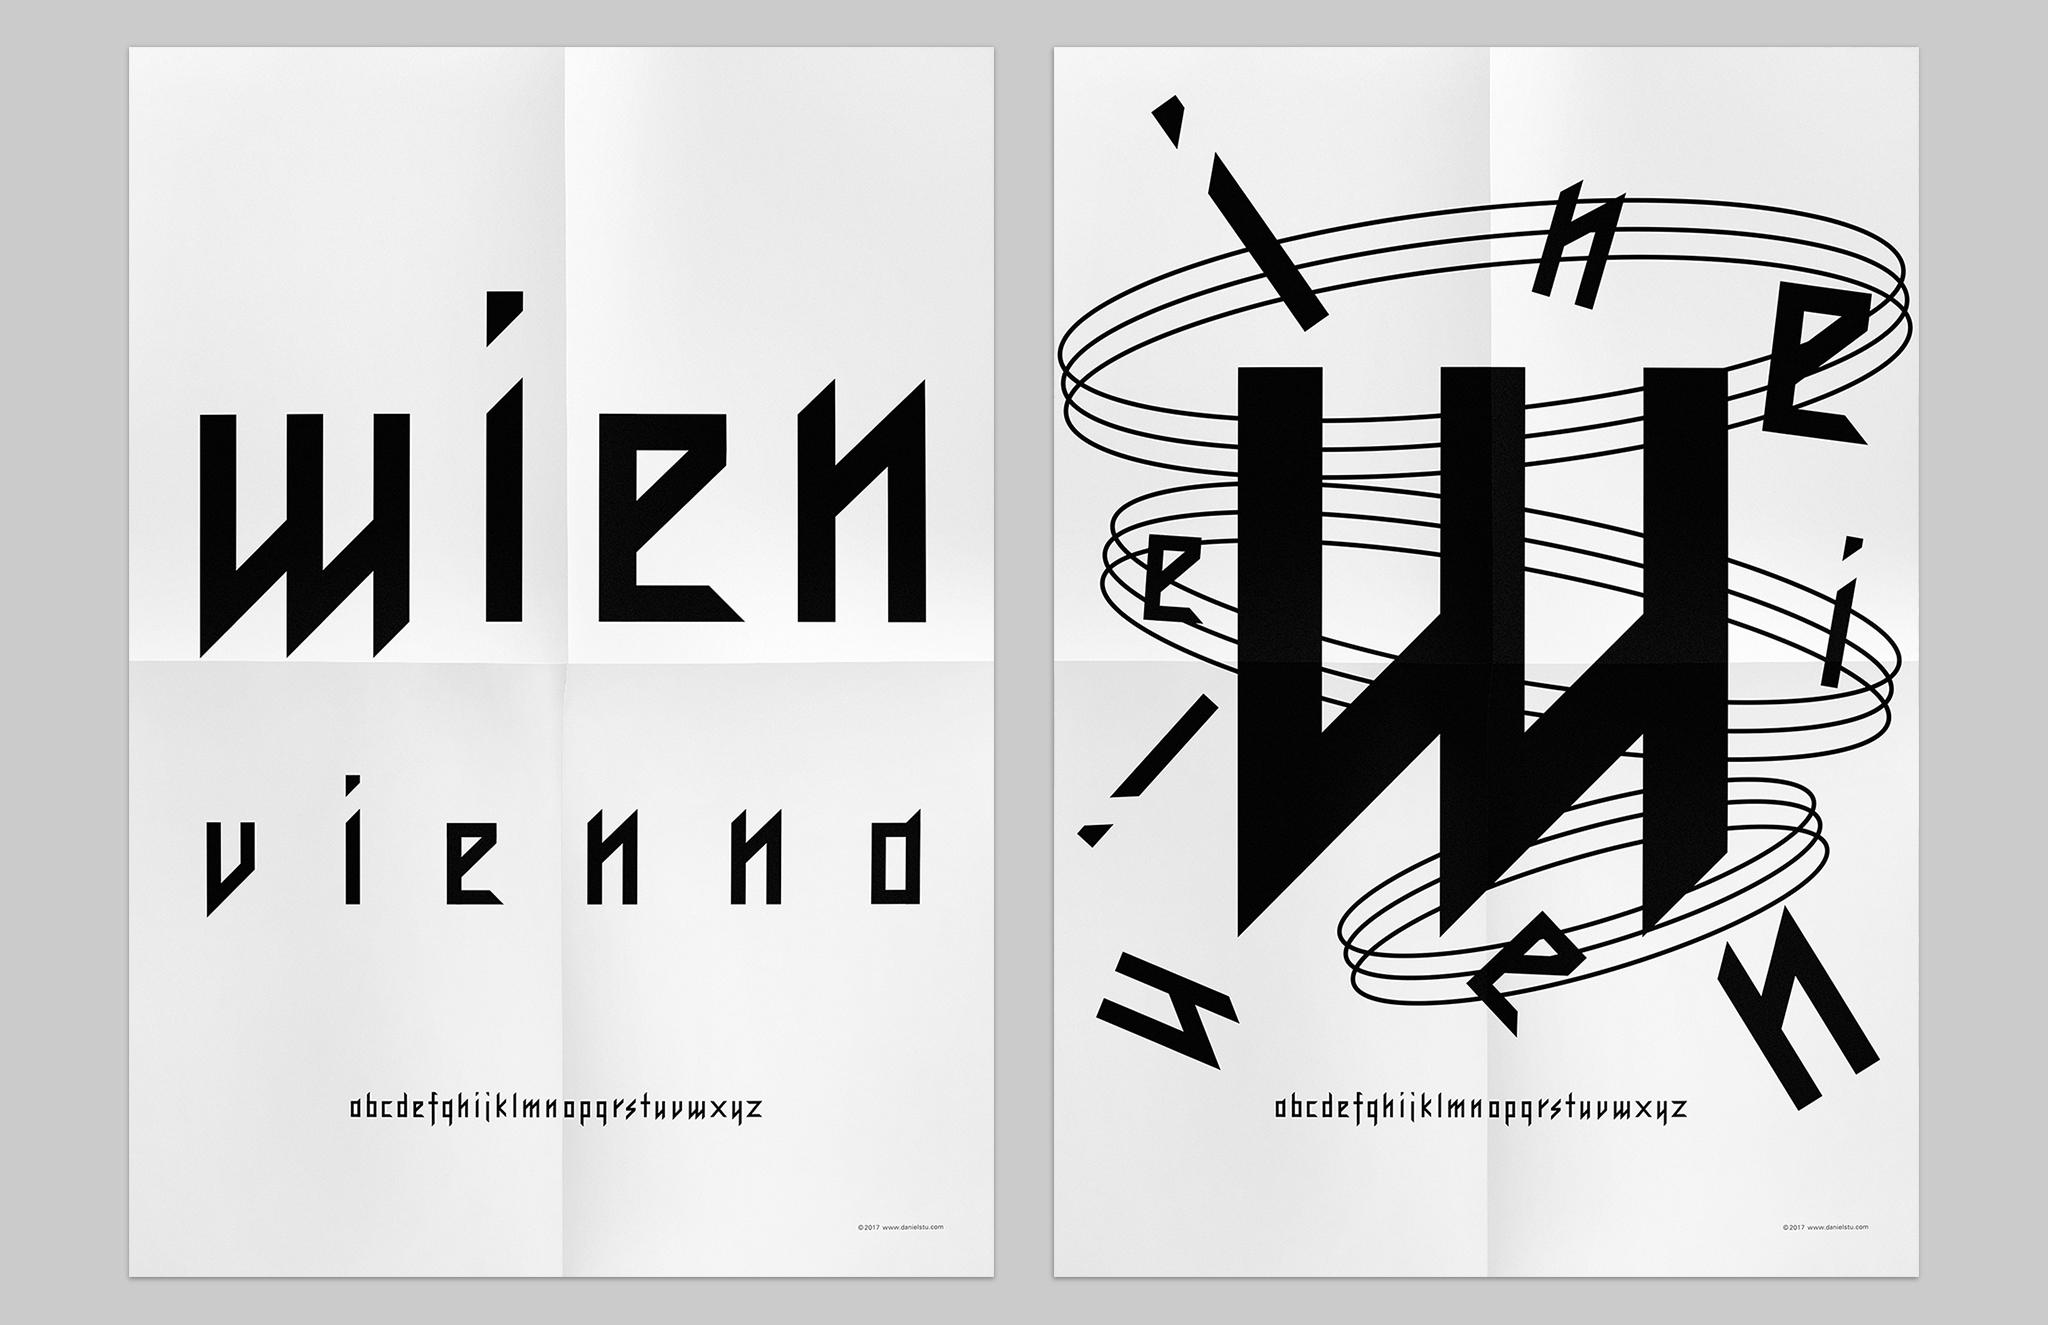 Daniel-Stuhlpfarrer_Visual-Communication_Graphic-Design_Poster_Wiener-Theater-Vienna_Overview-2